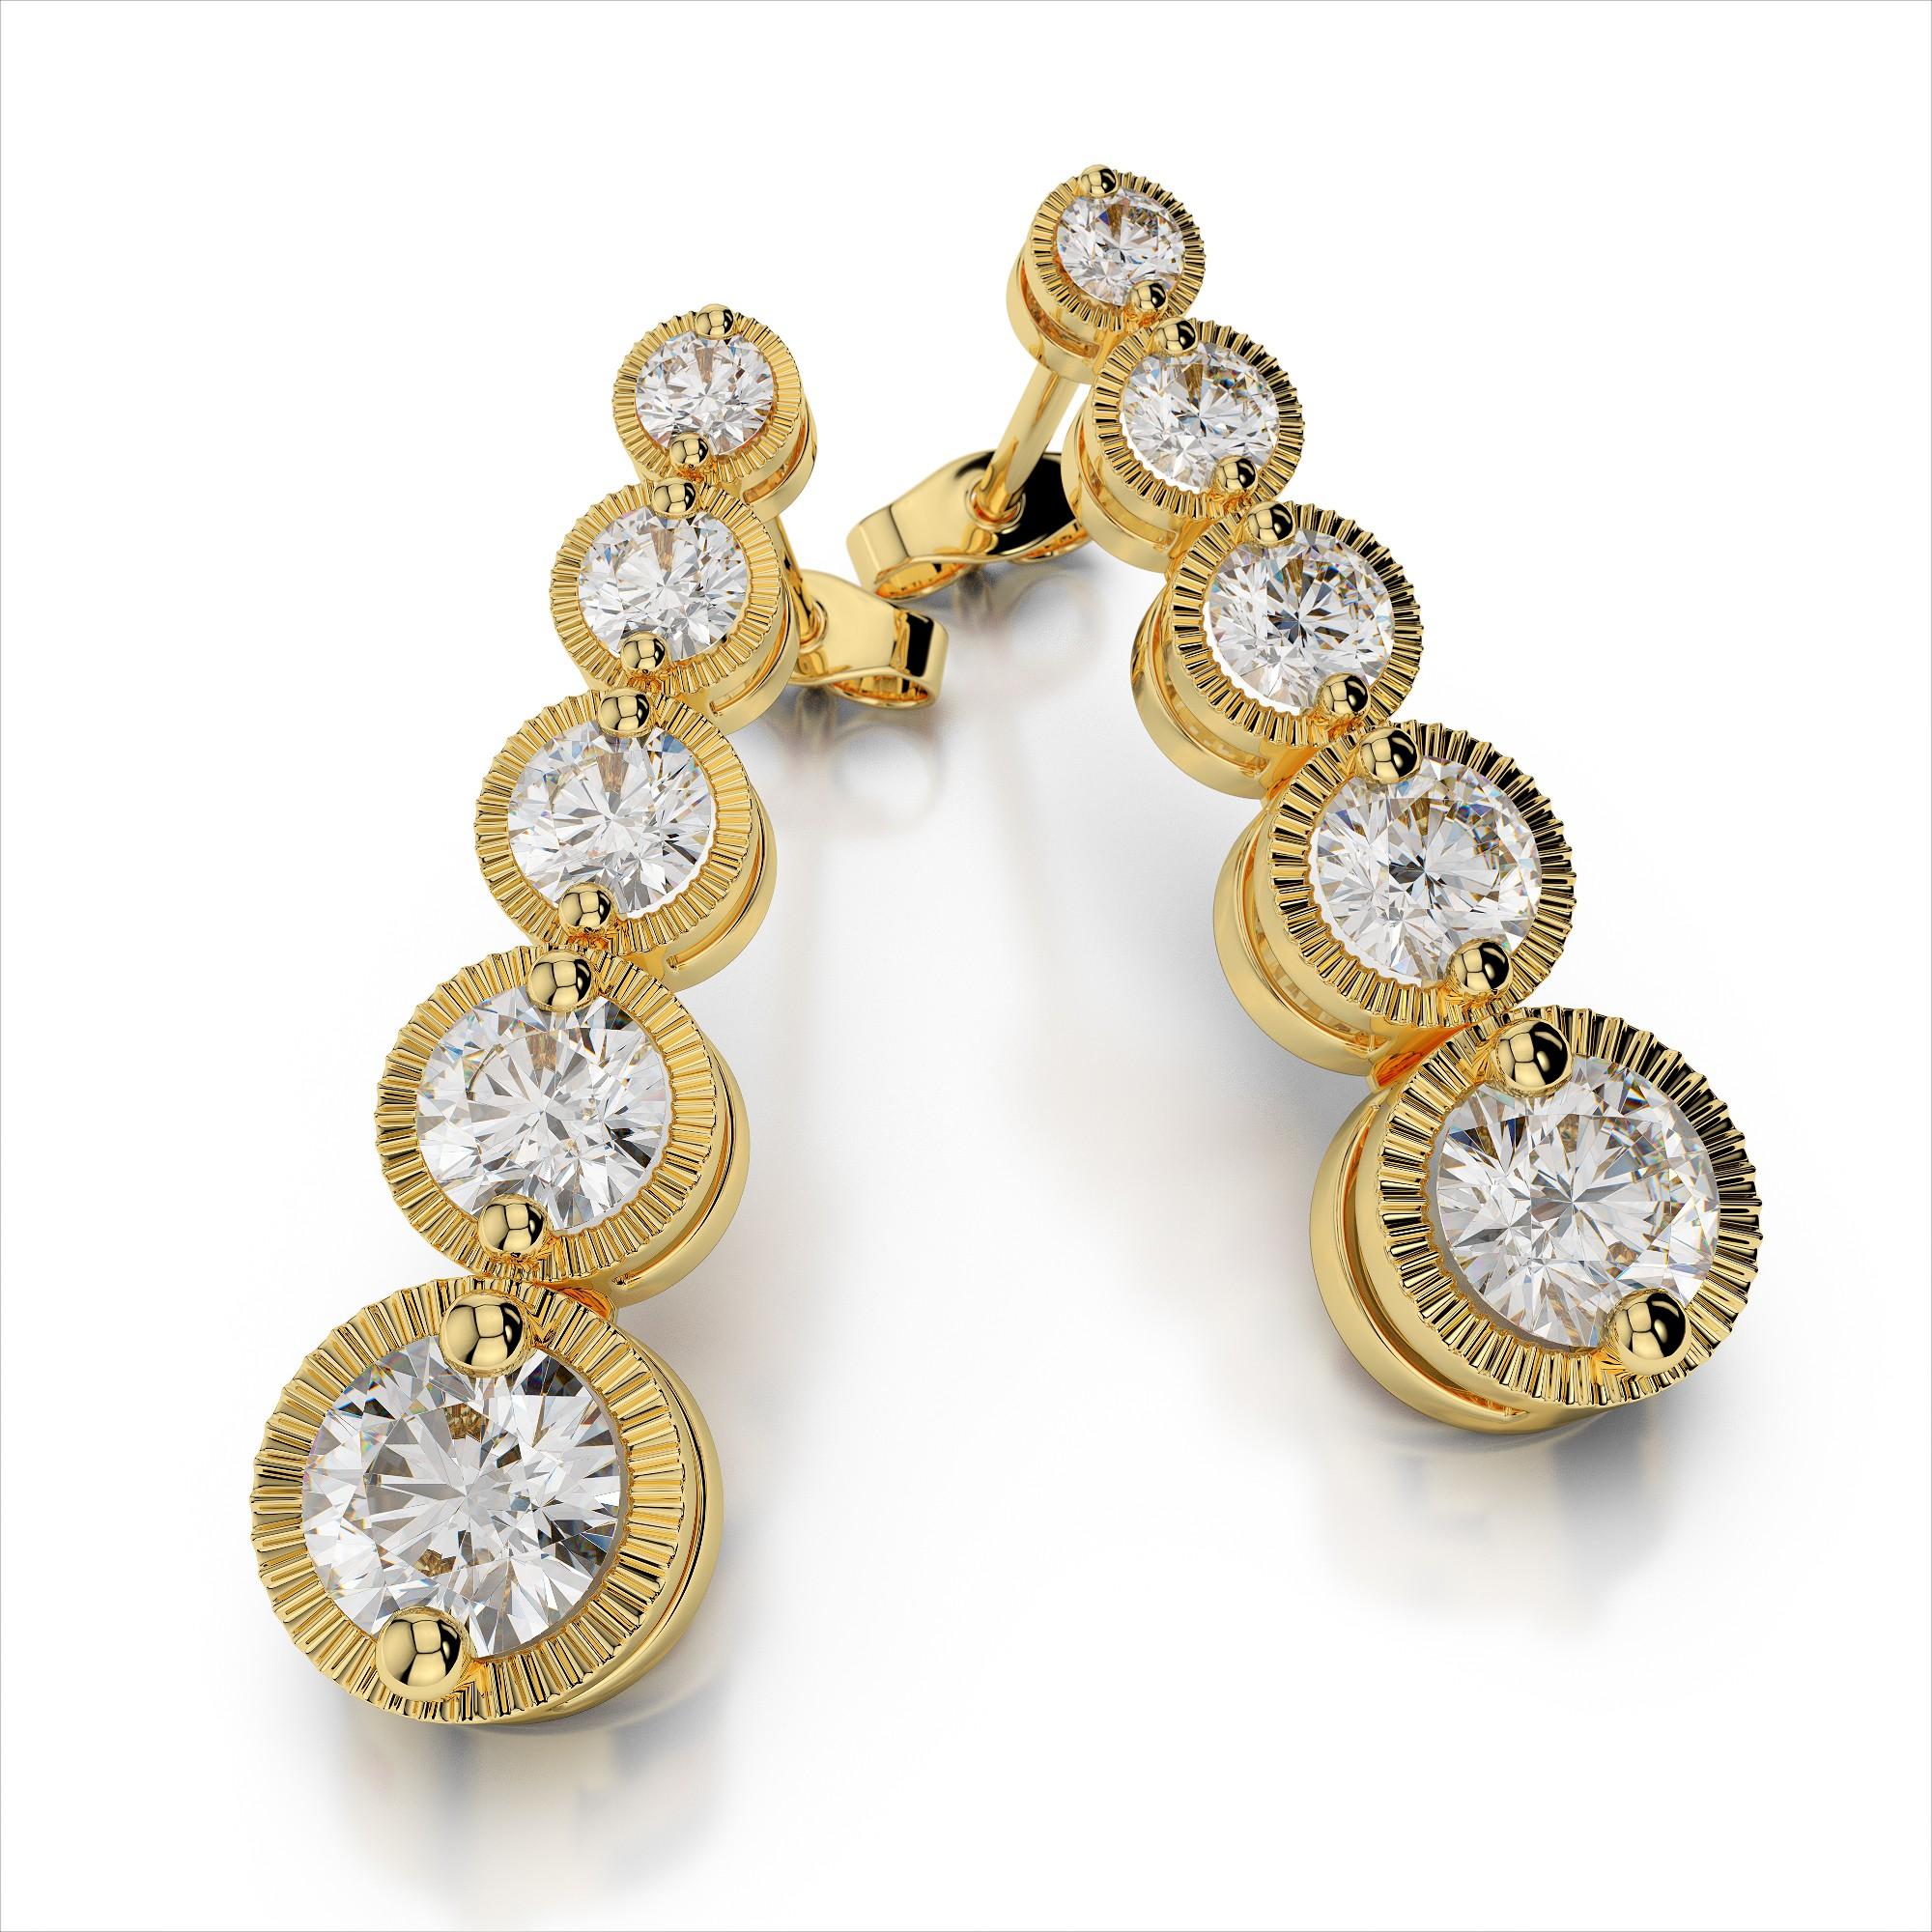 Diamond Journey Earrings with Milgrain